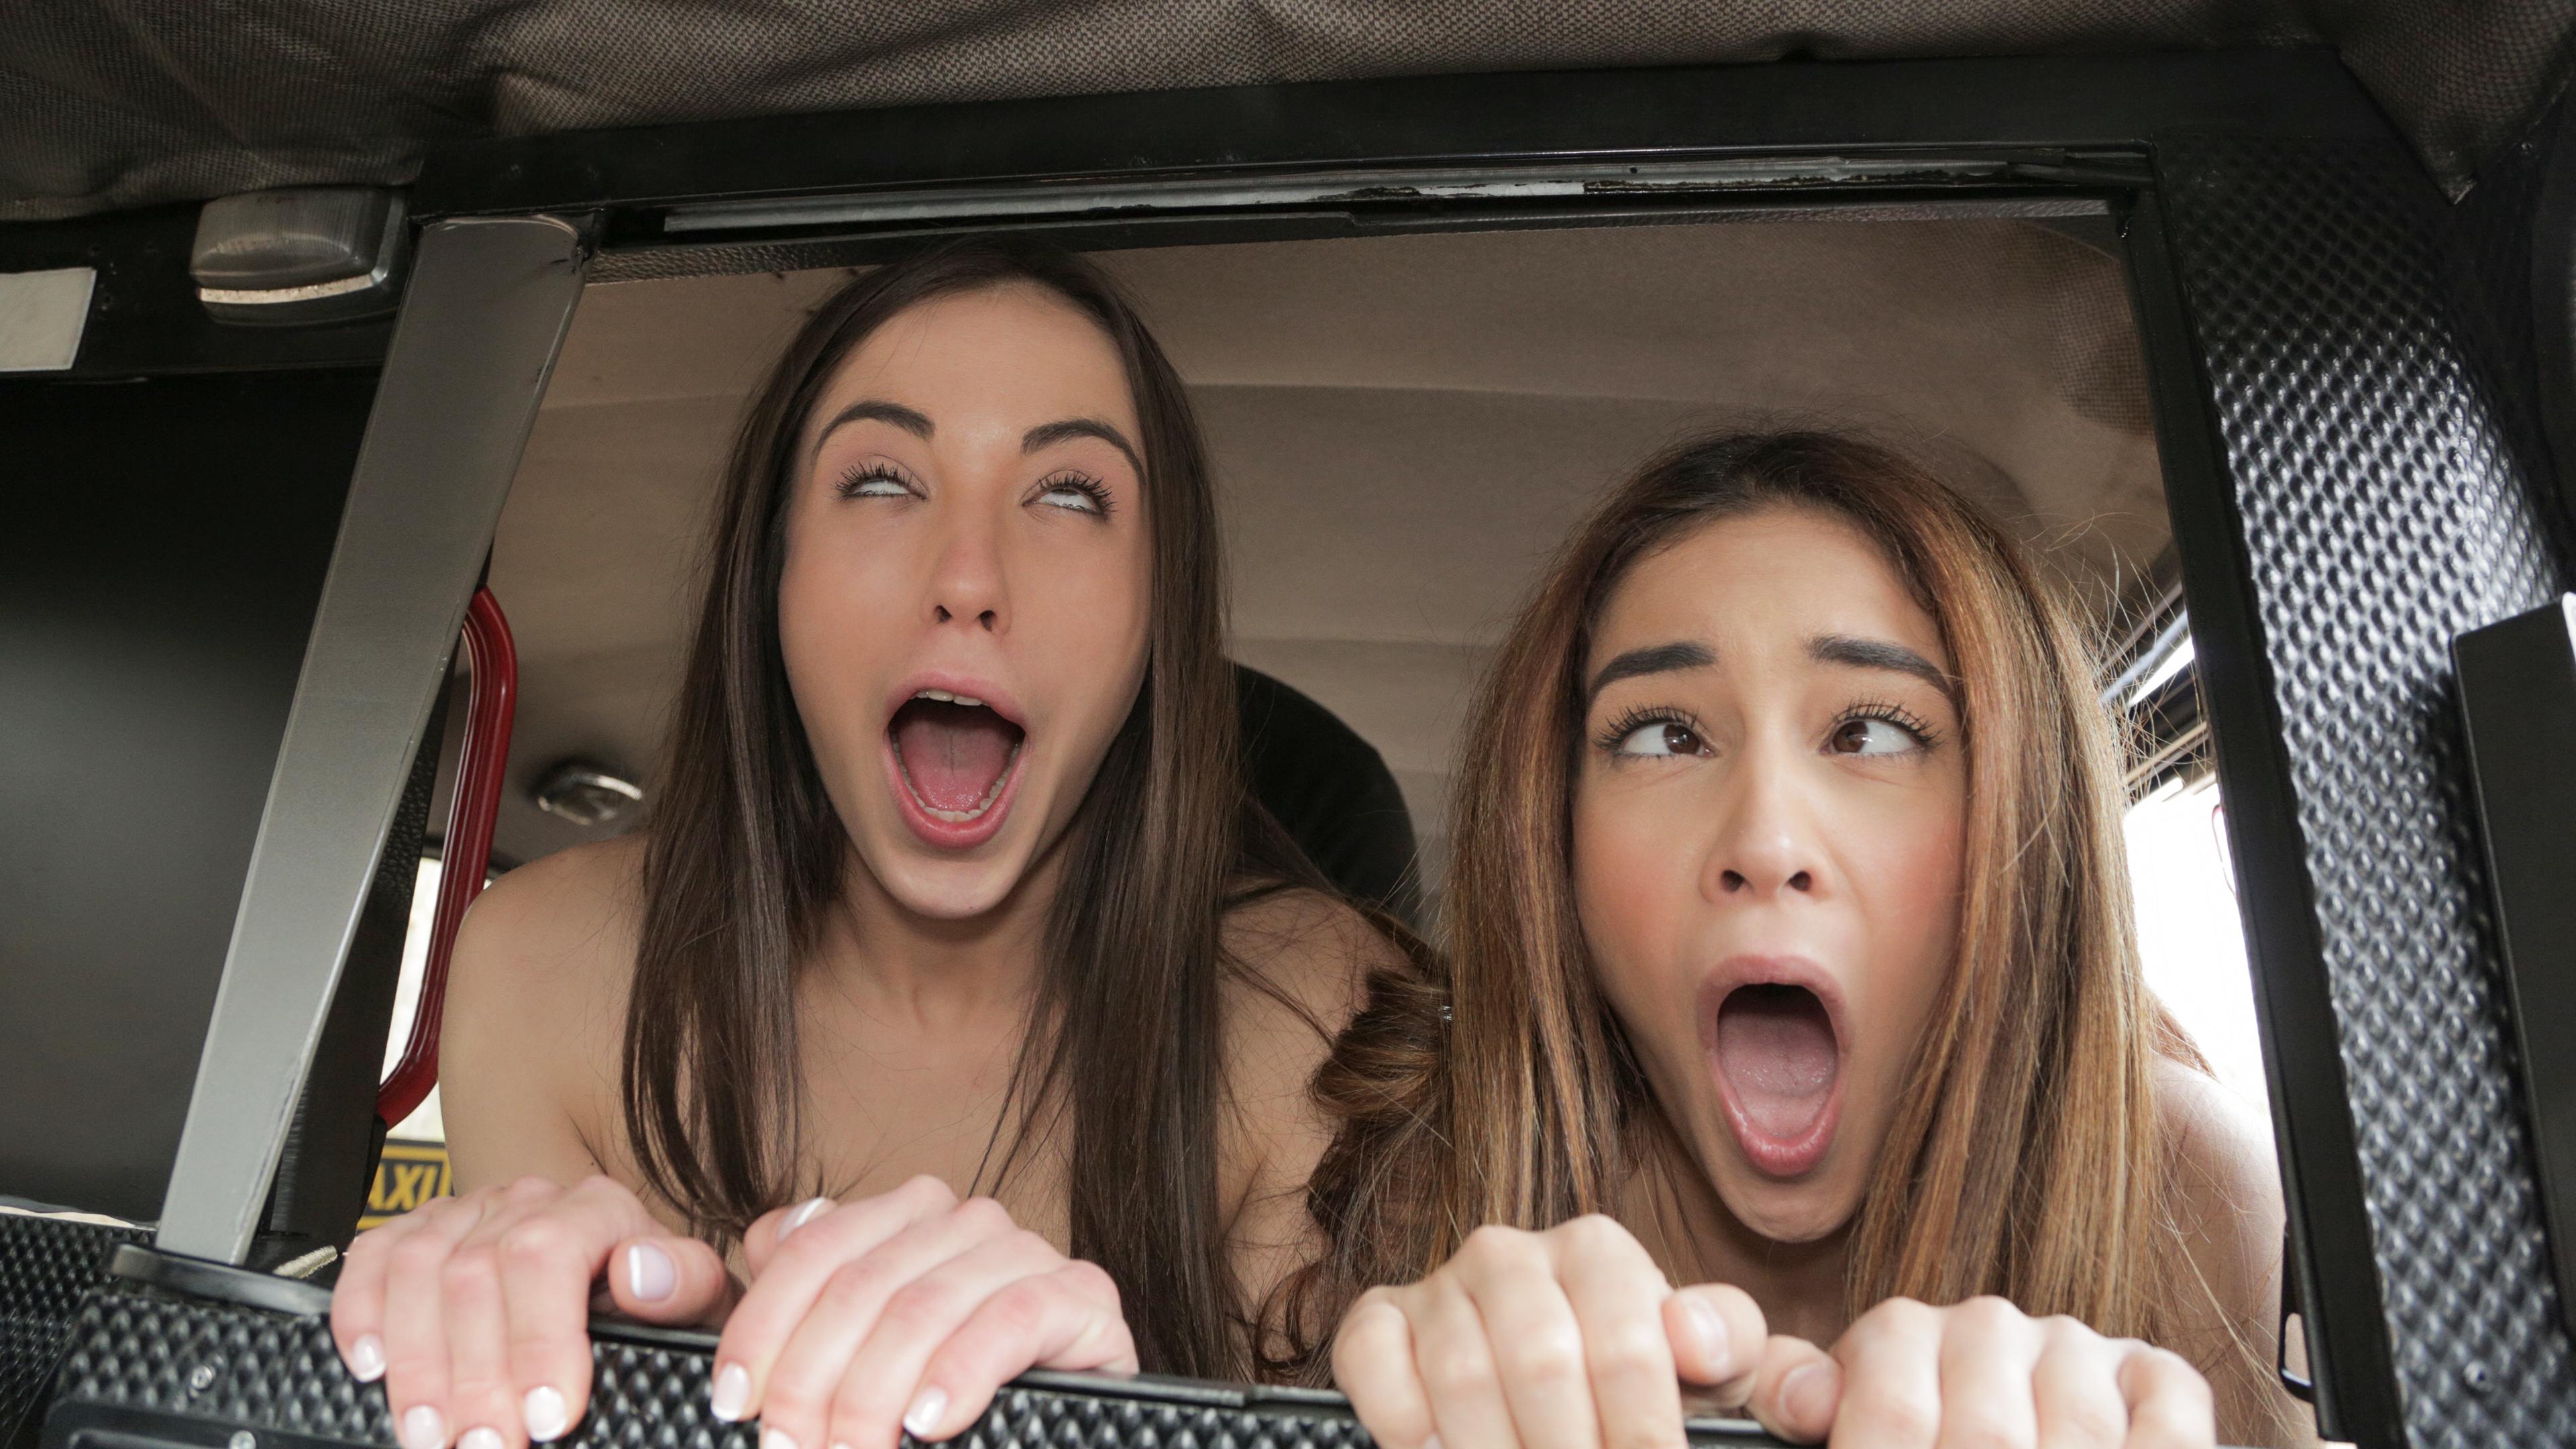 Cheeky Spanish Lesbians fuck Cabbie - Fake Taxi